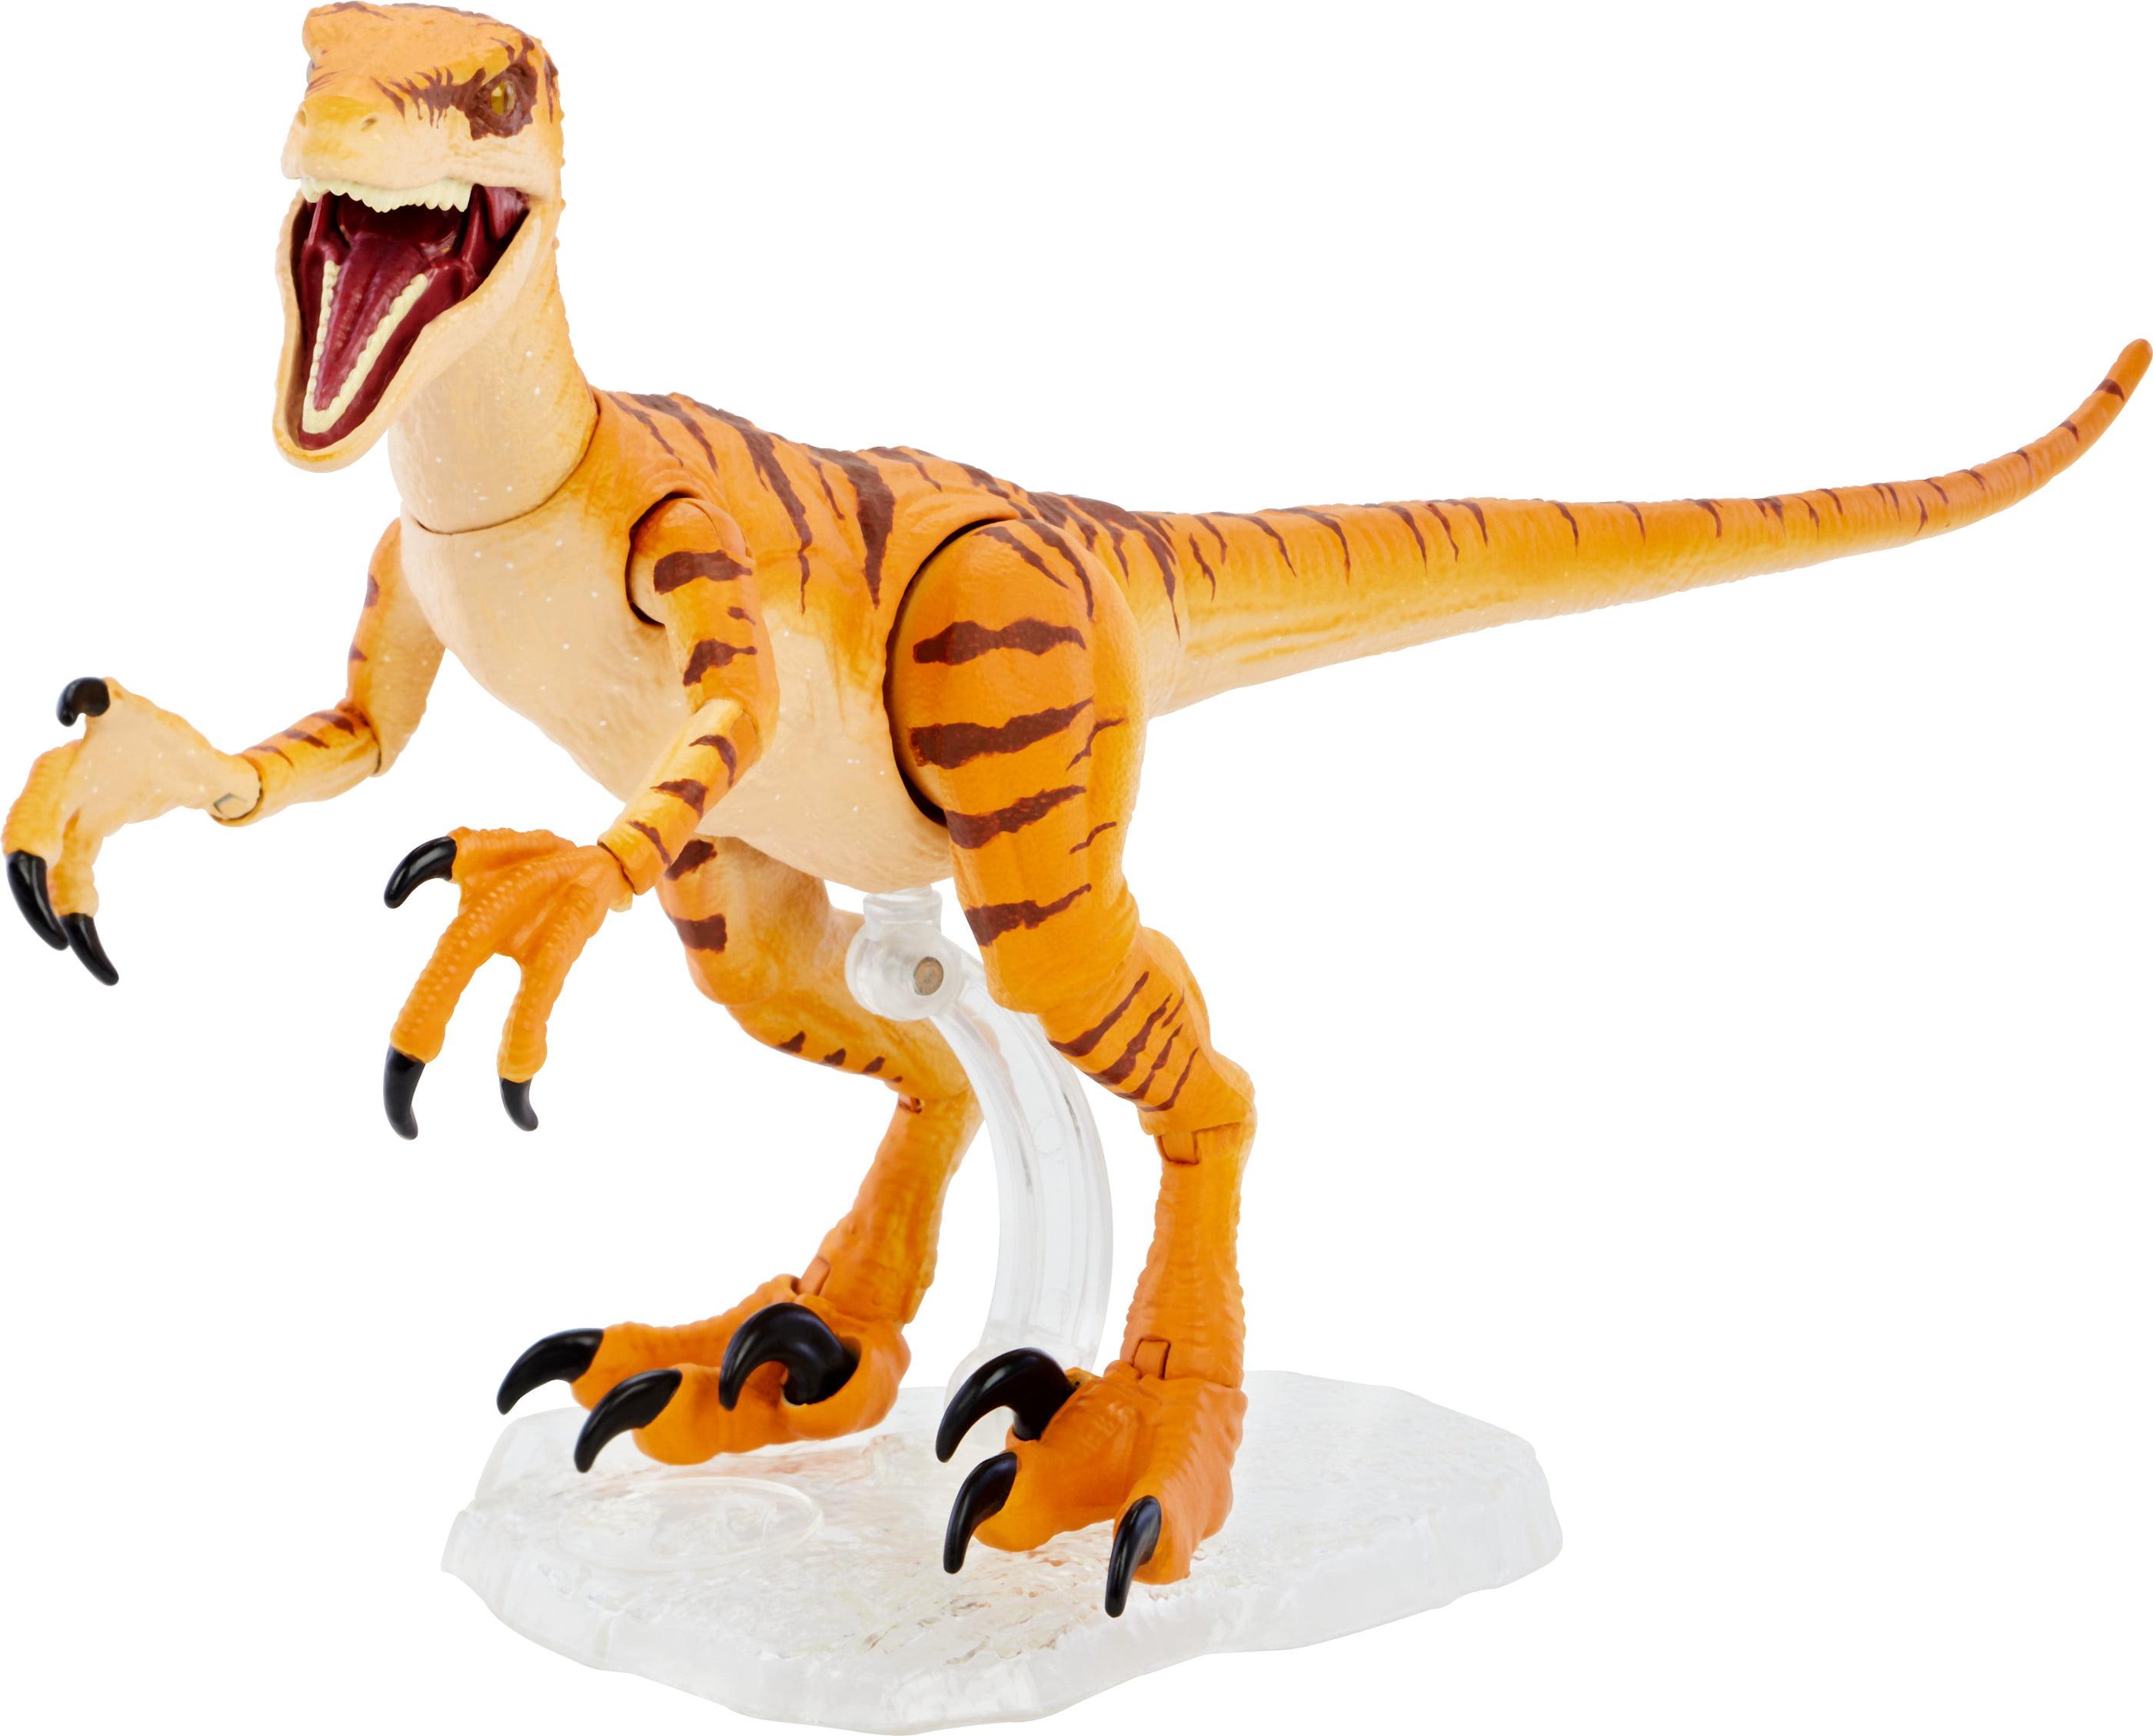 Jurassic World Amber Collection Tiger Velociraptor 6 inch Action Figure